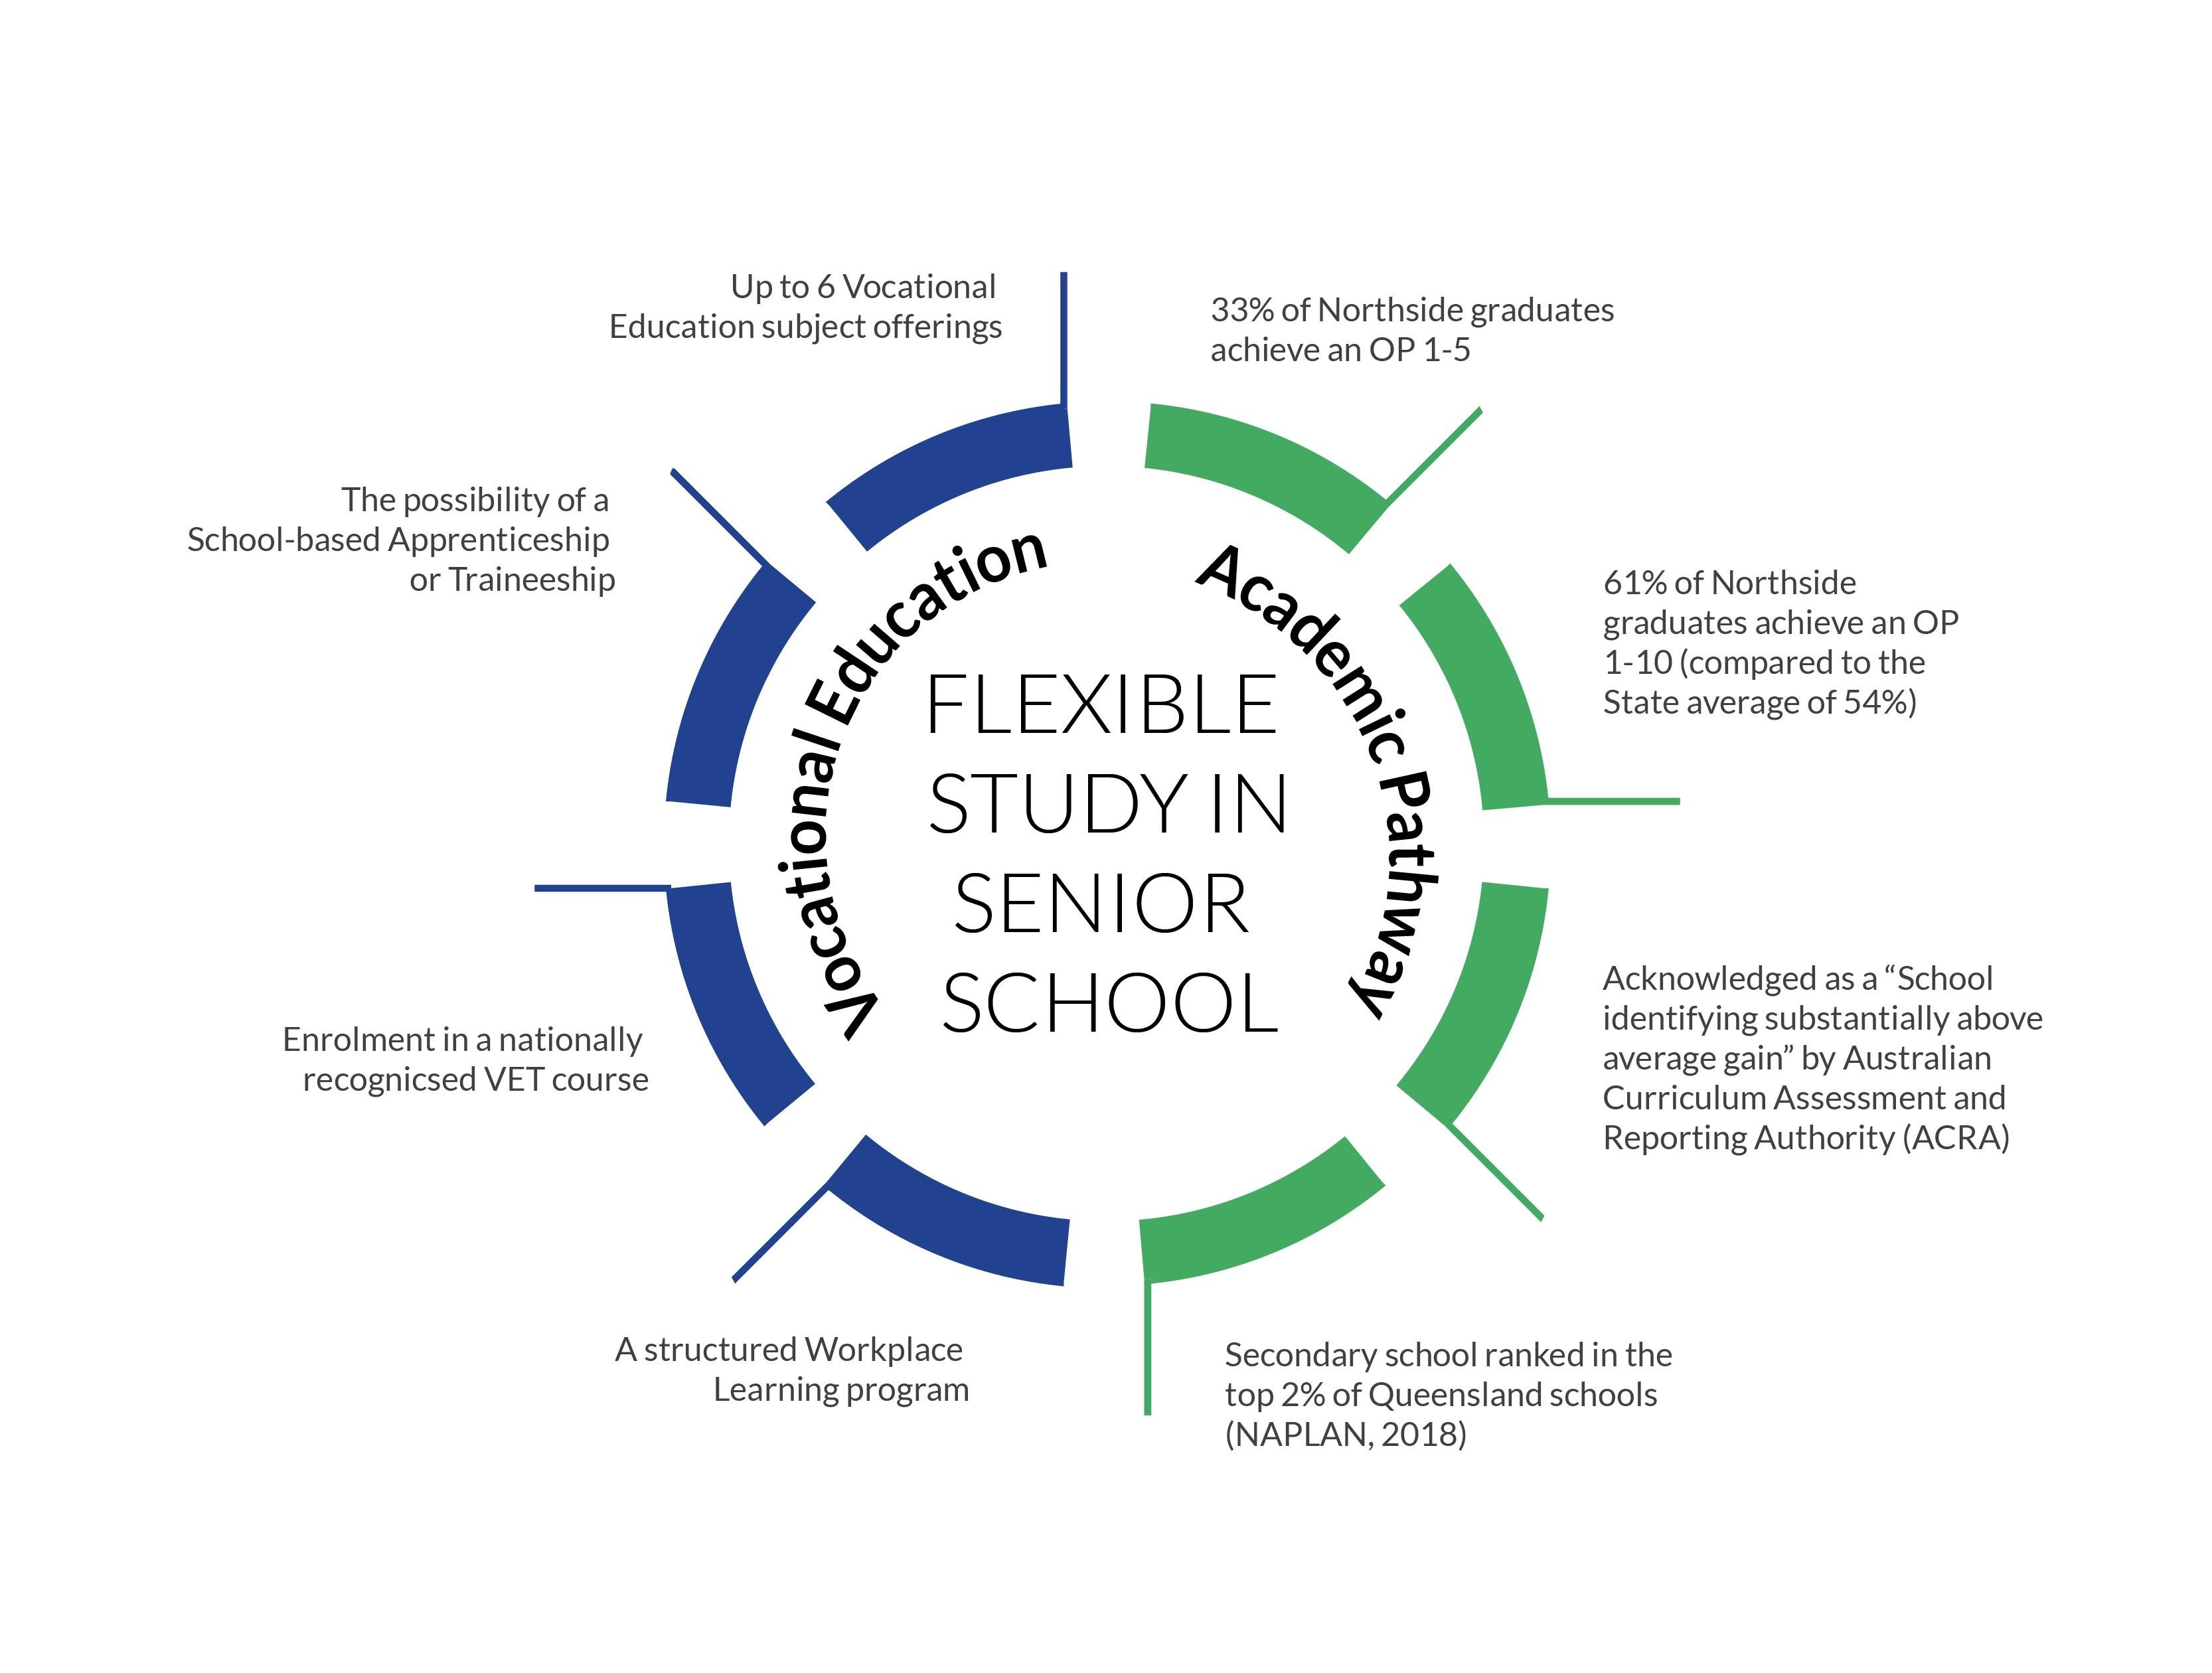 12.02.19_Academic-Vocational-Education-Pathways_Diagram-01.jpg?mtime=20190212160504#asset:9783:url